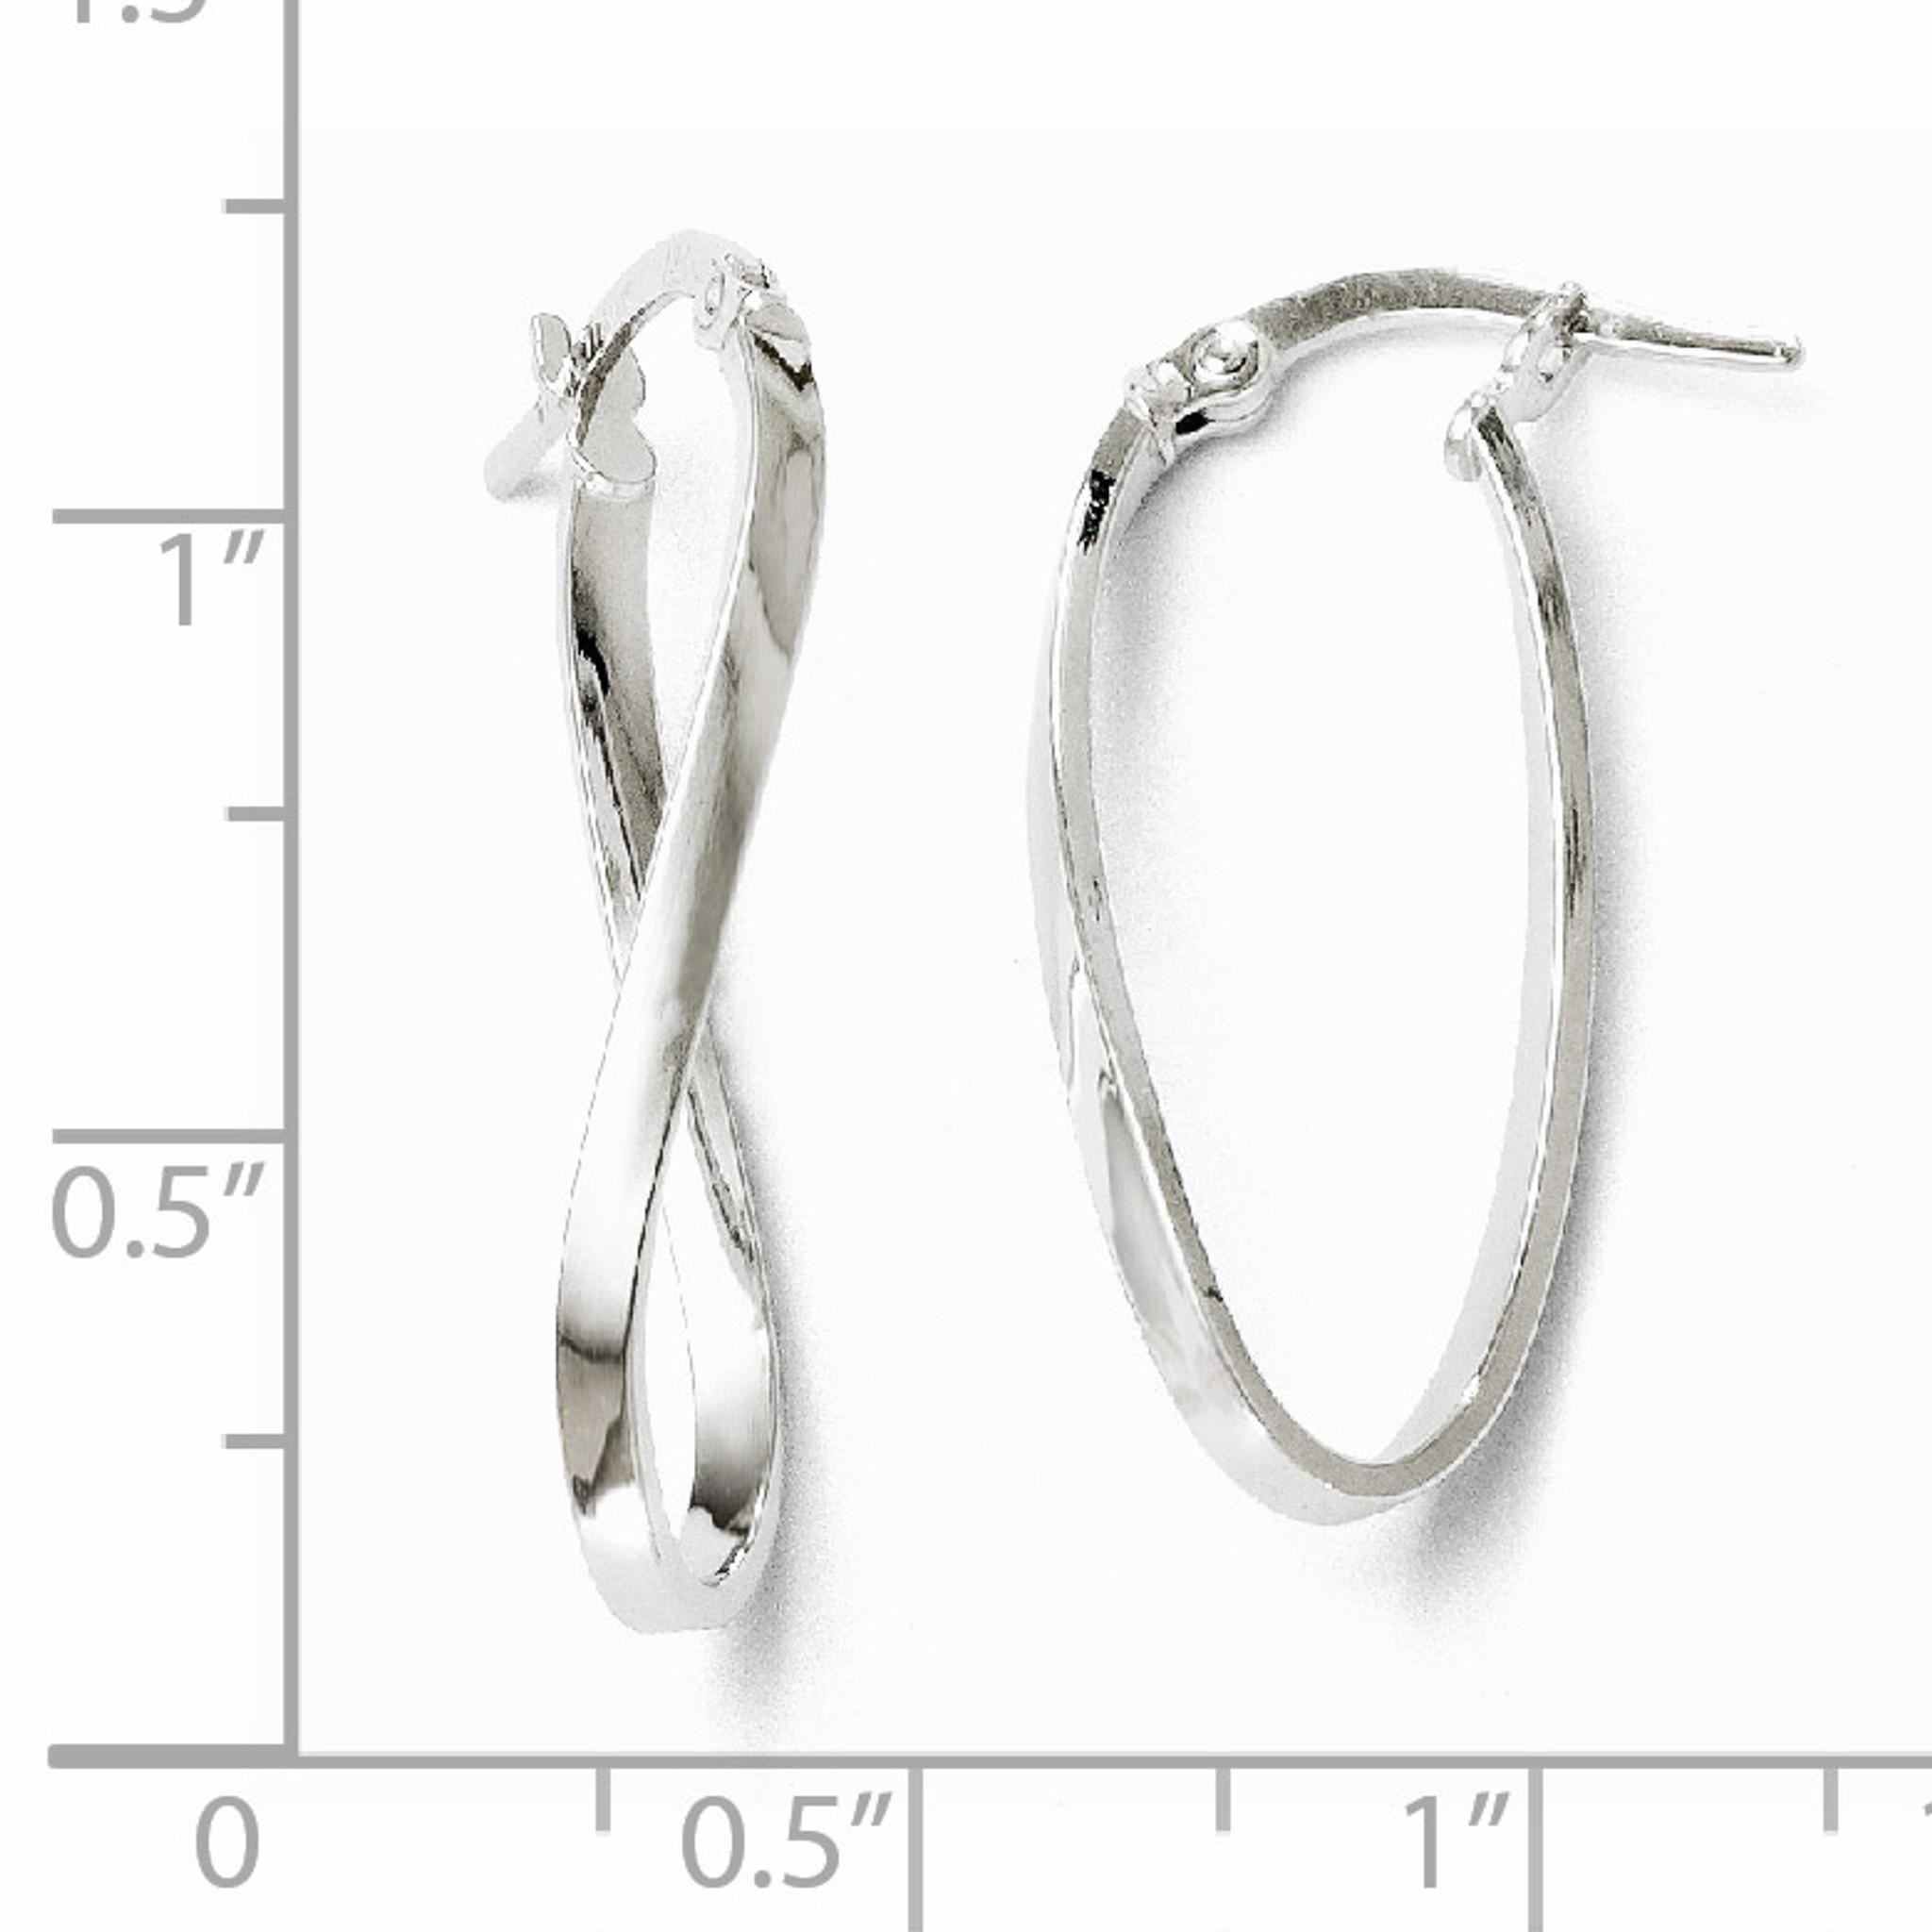 Leslies 10k White Gold Polished Oval Hinged Hoop Earrings